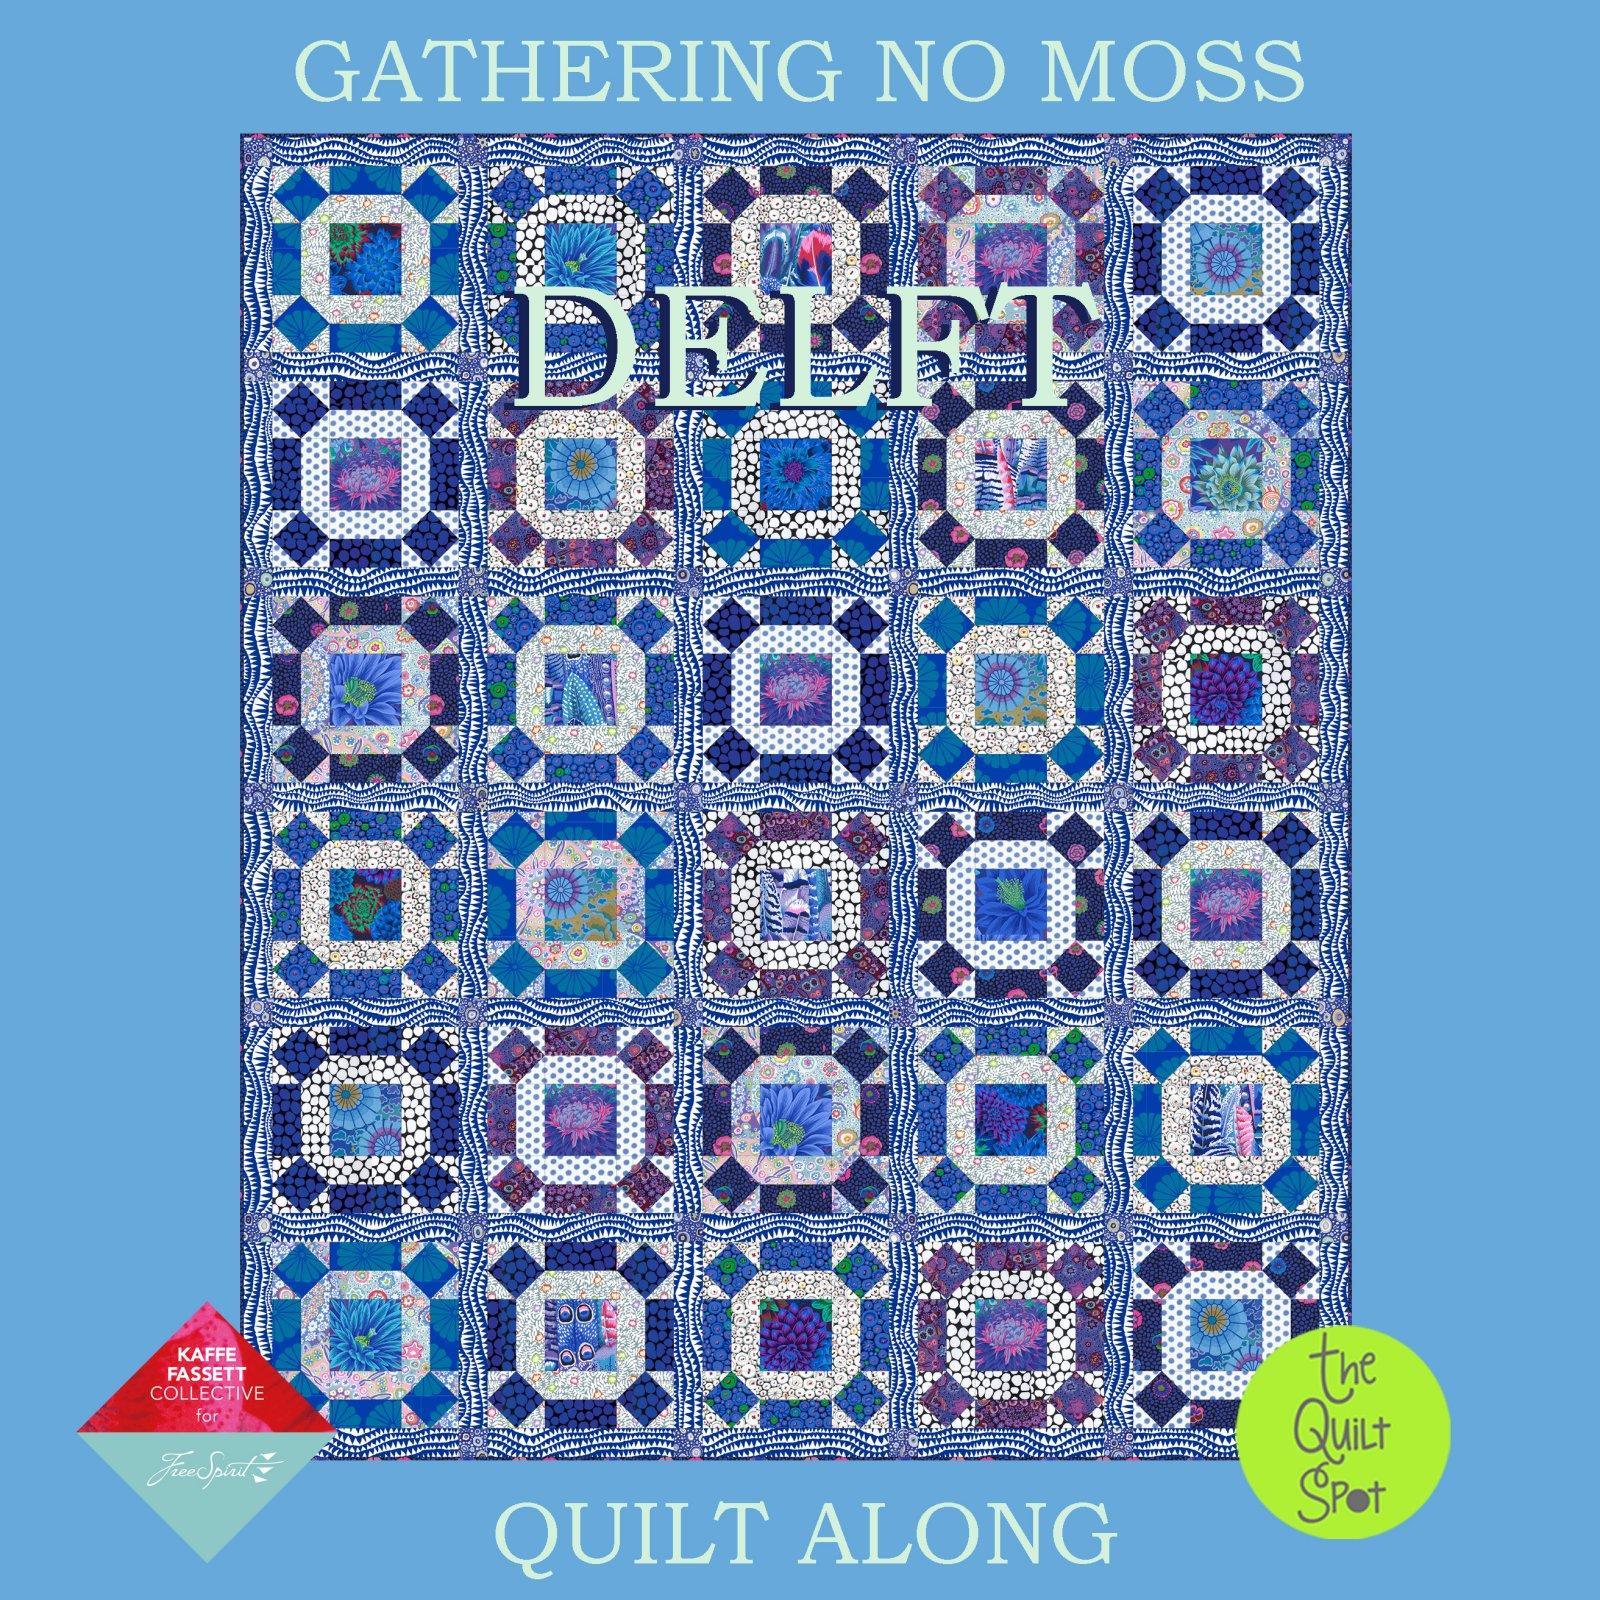 Kaffe Fassett Gathering No Moss Quilt Kit - Delft Colorway